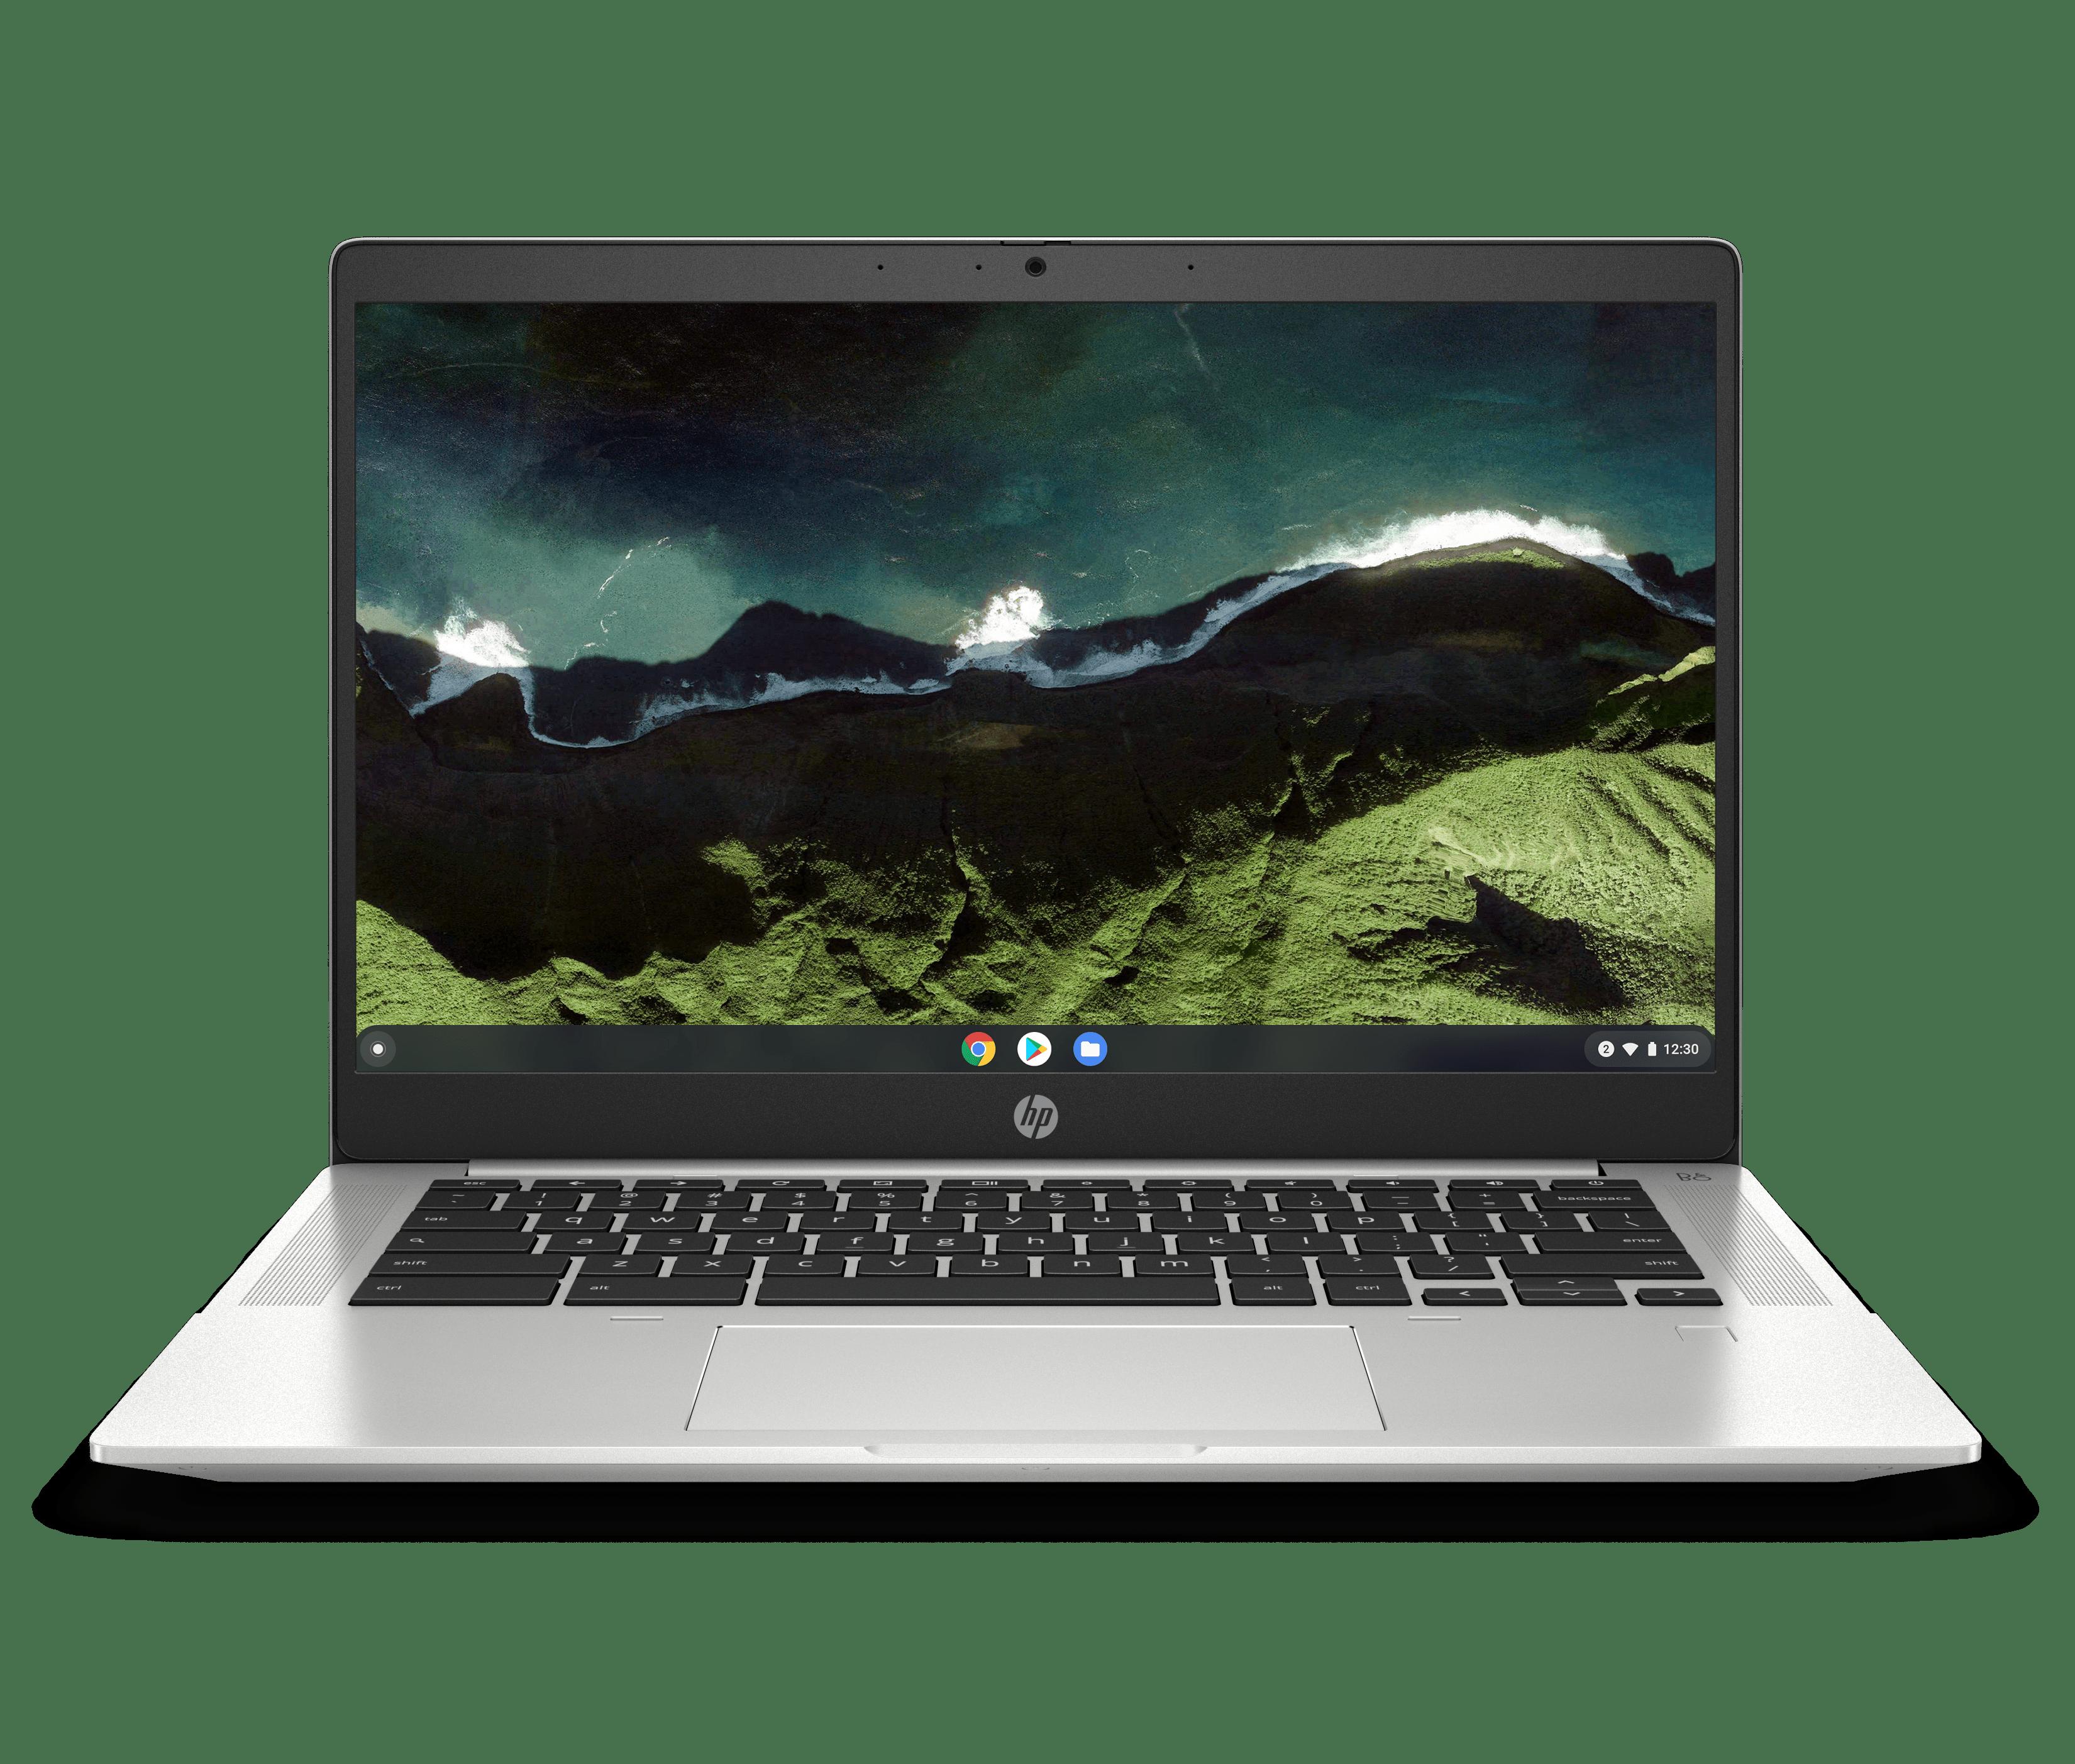 HP Pro c640 G2 Chromebook Enterprise